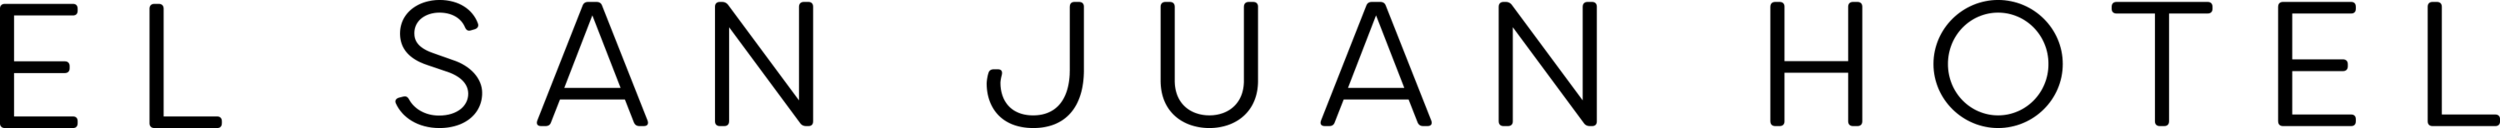 ESJH logo.png